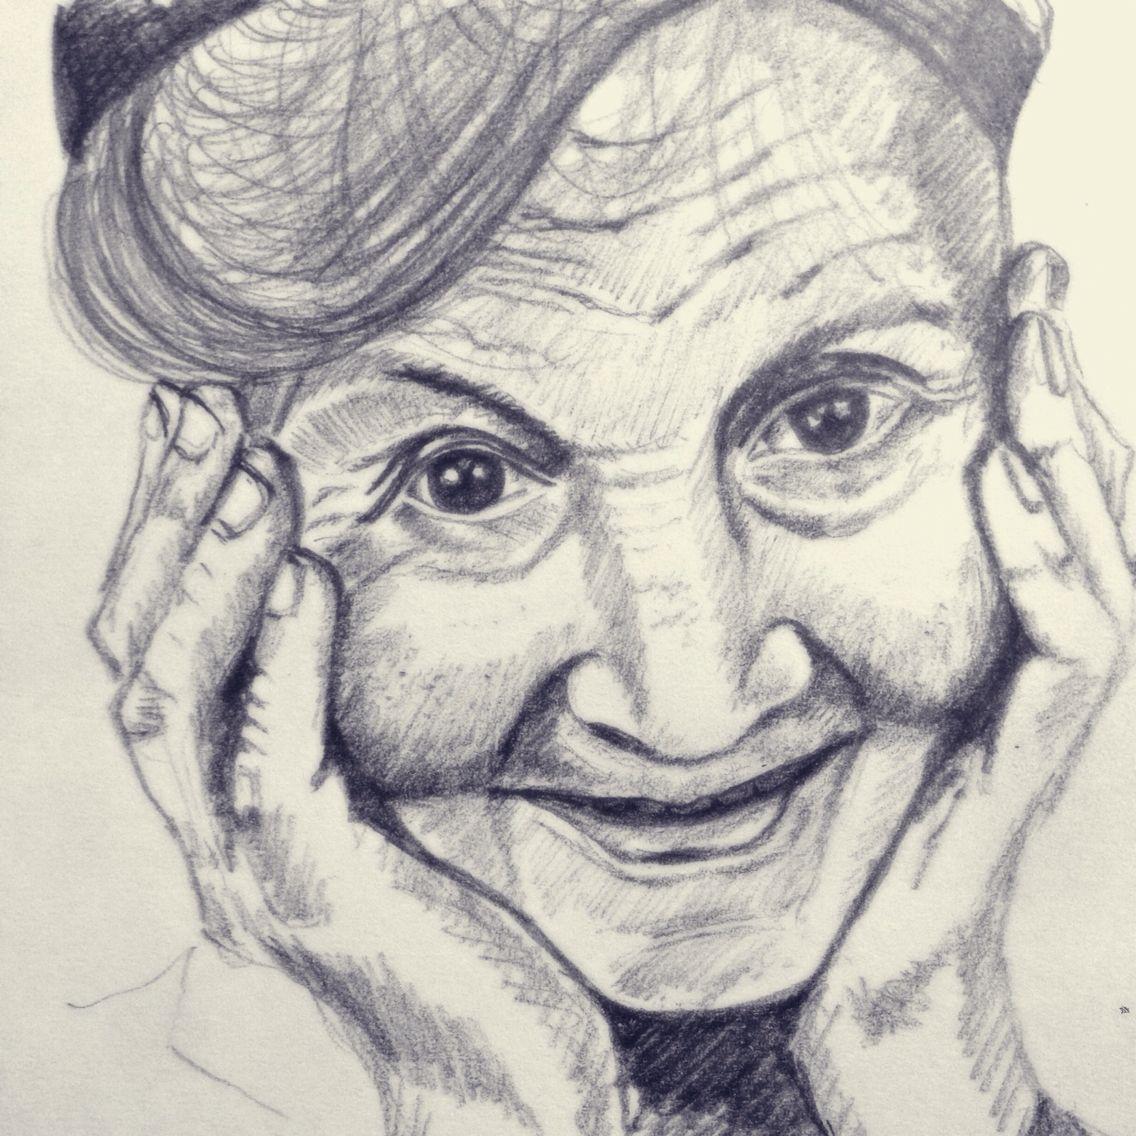 Smile pencil sketch on paper